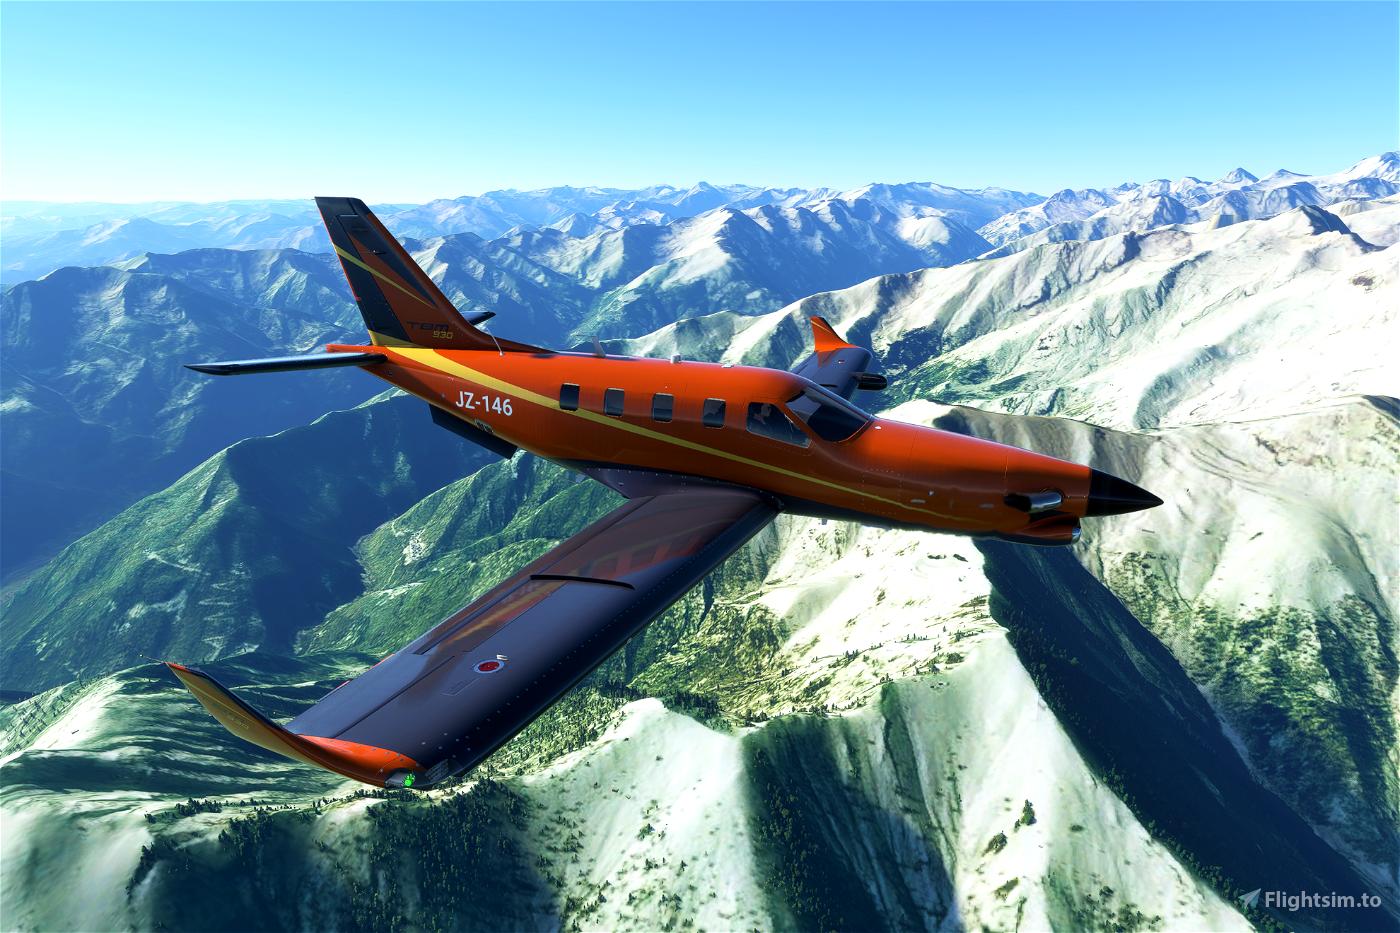 Daher TBM 930 X series (now 9 colours) Flight Simulator 2020